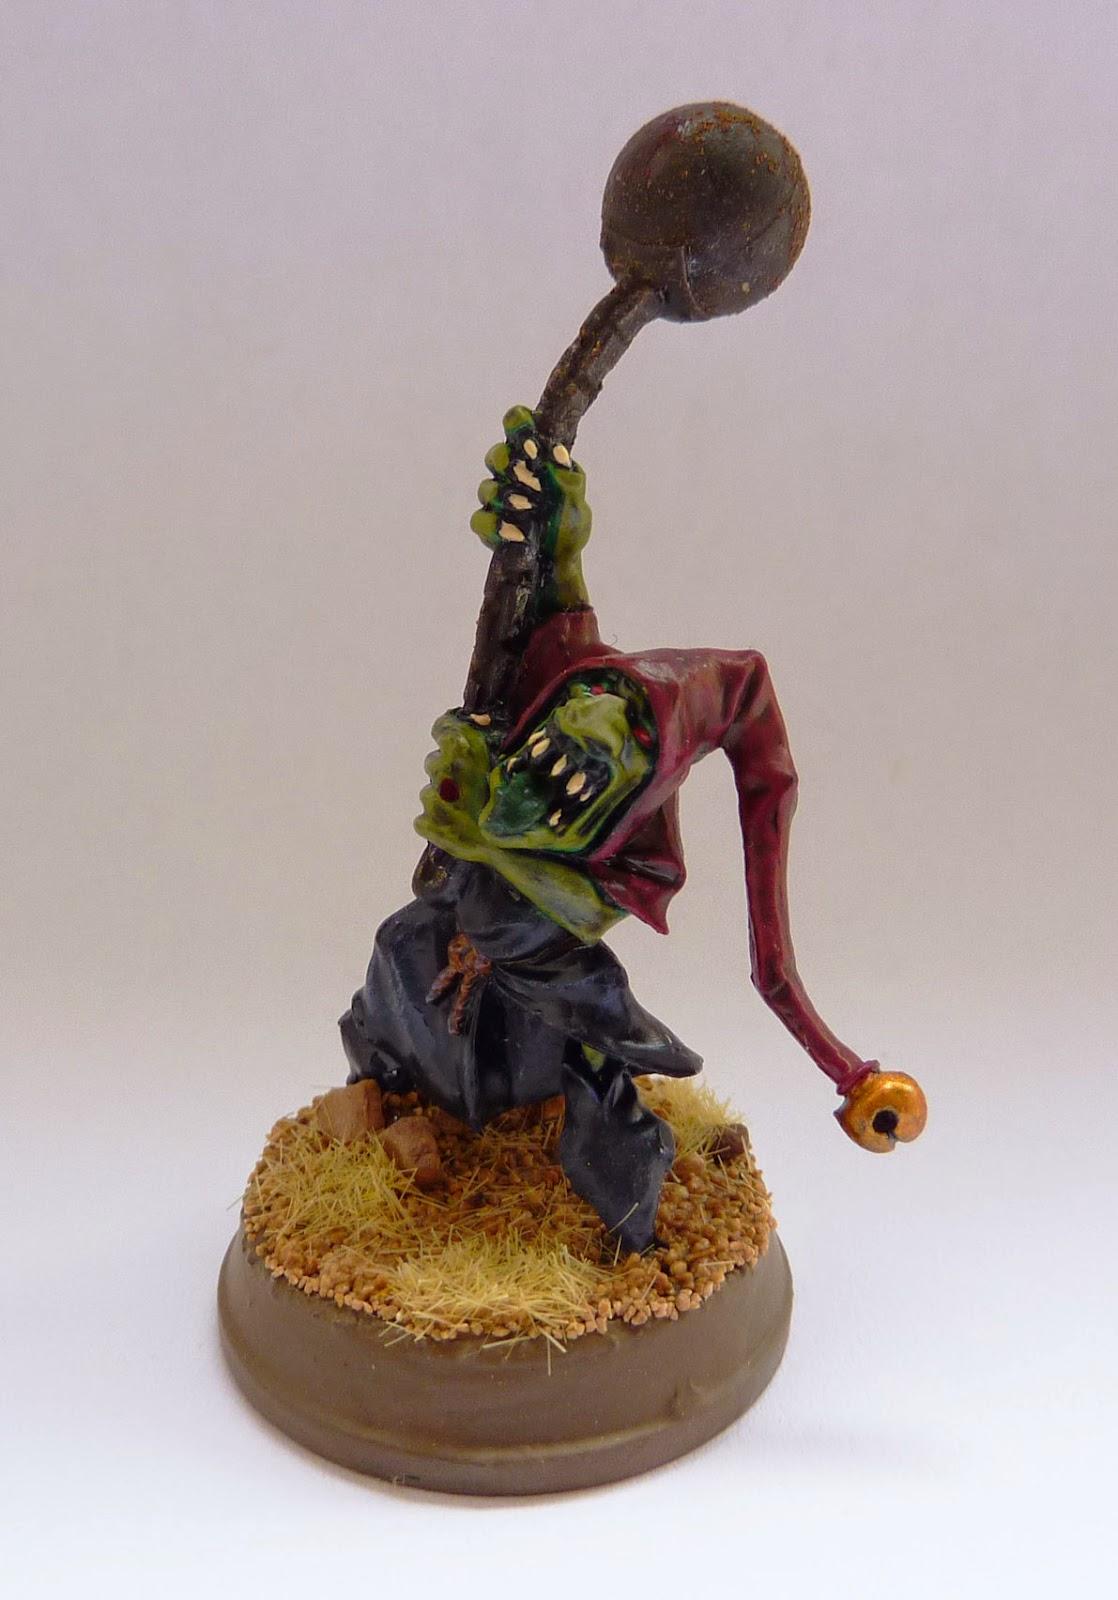 Night Goblin fanatic from Warhammer Fantasy Battle.